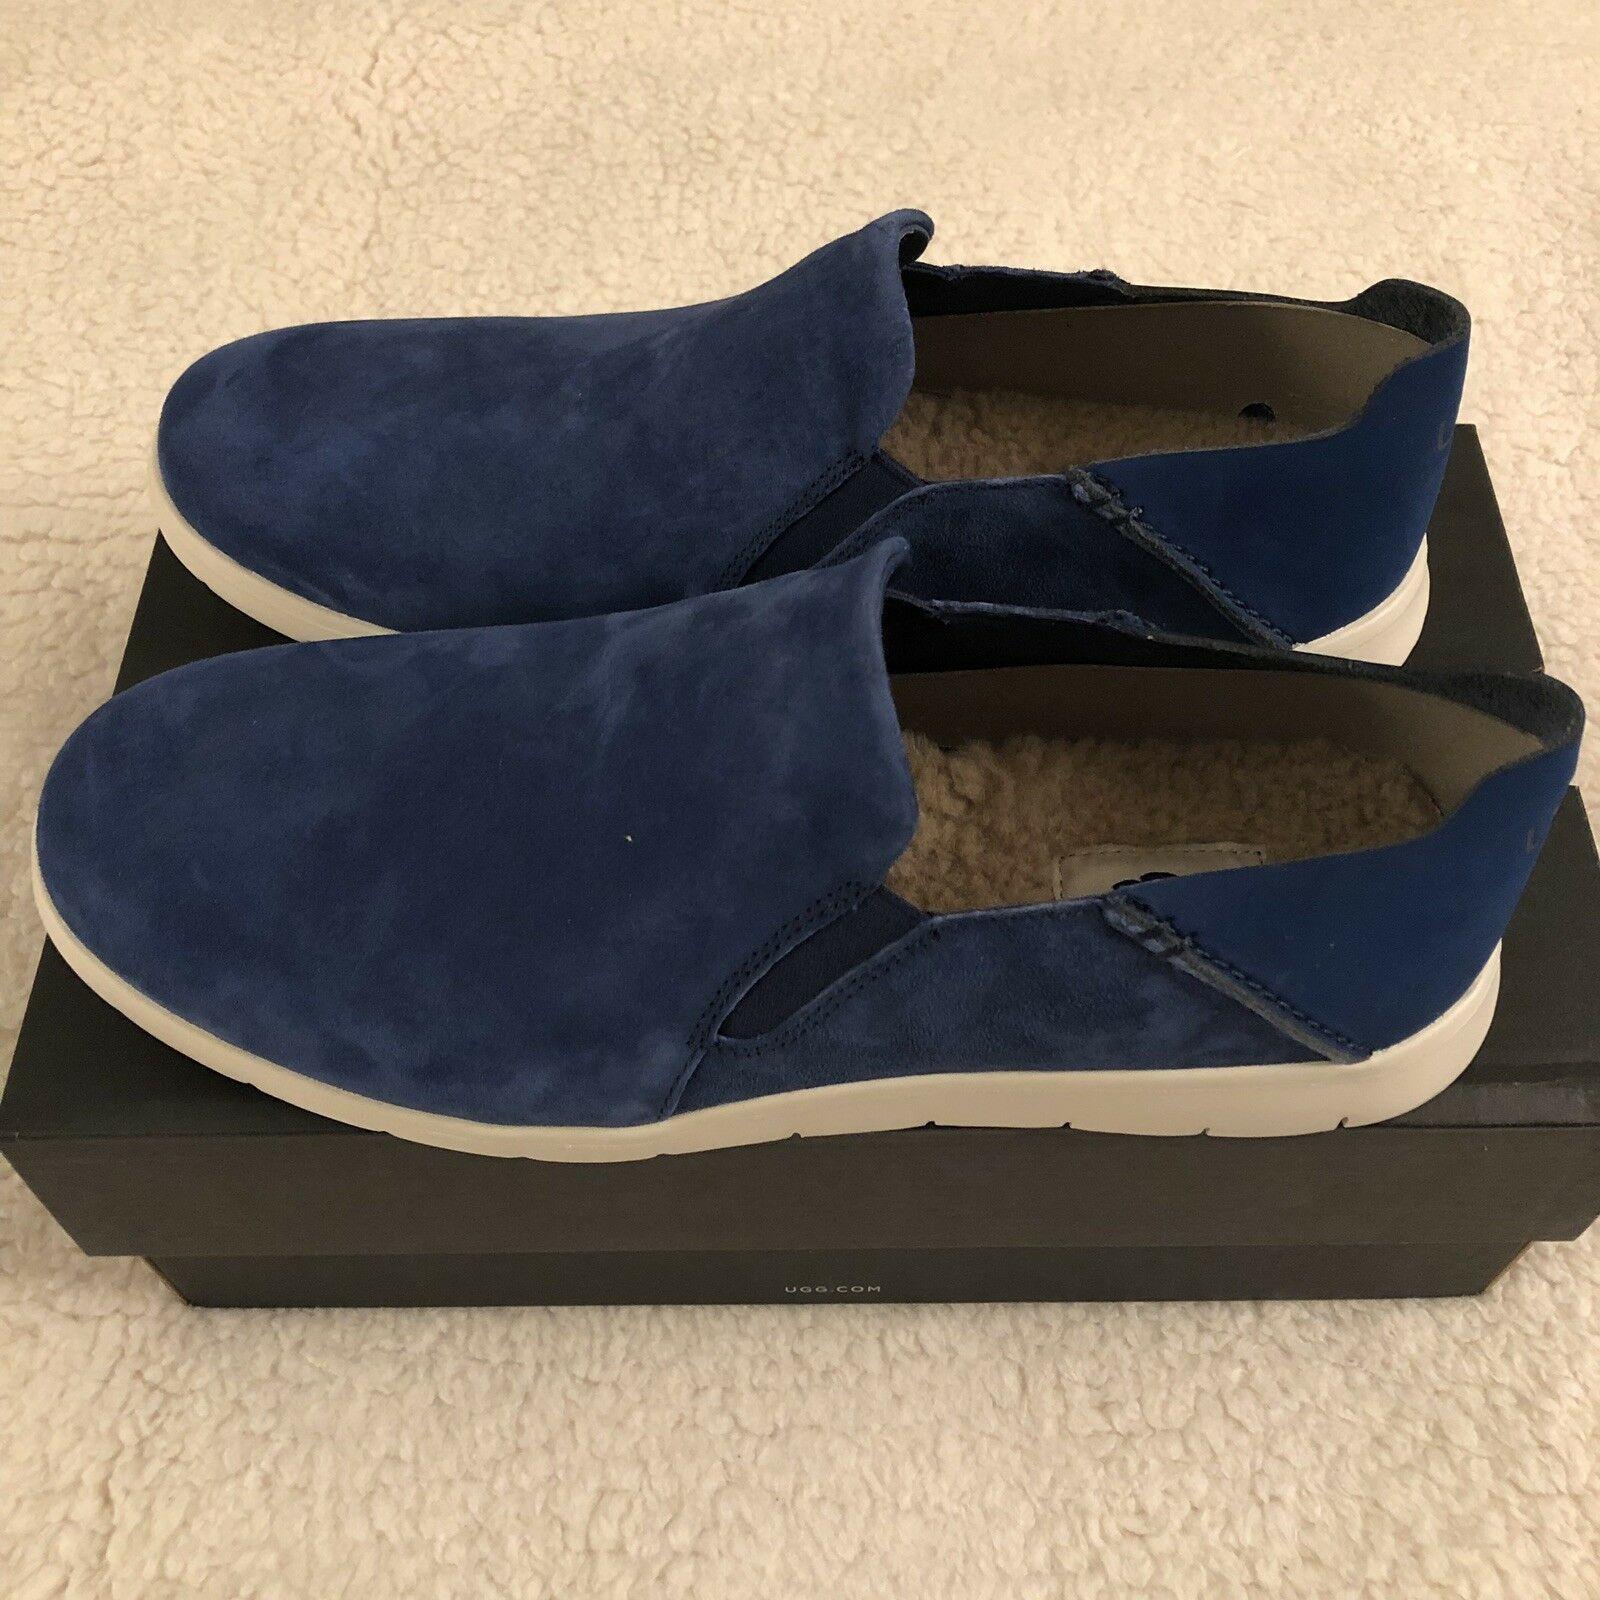 NEW UGG Men's Knox Suede Slip On Sneaker, Sizes 9, 11  Blue, MSRP $100 image 7